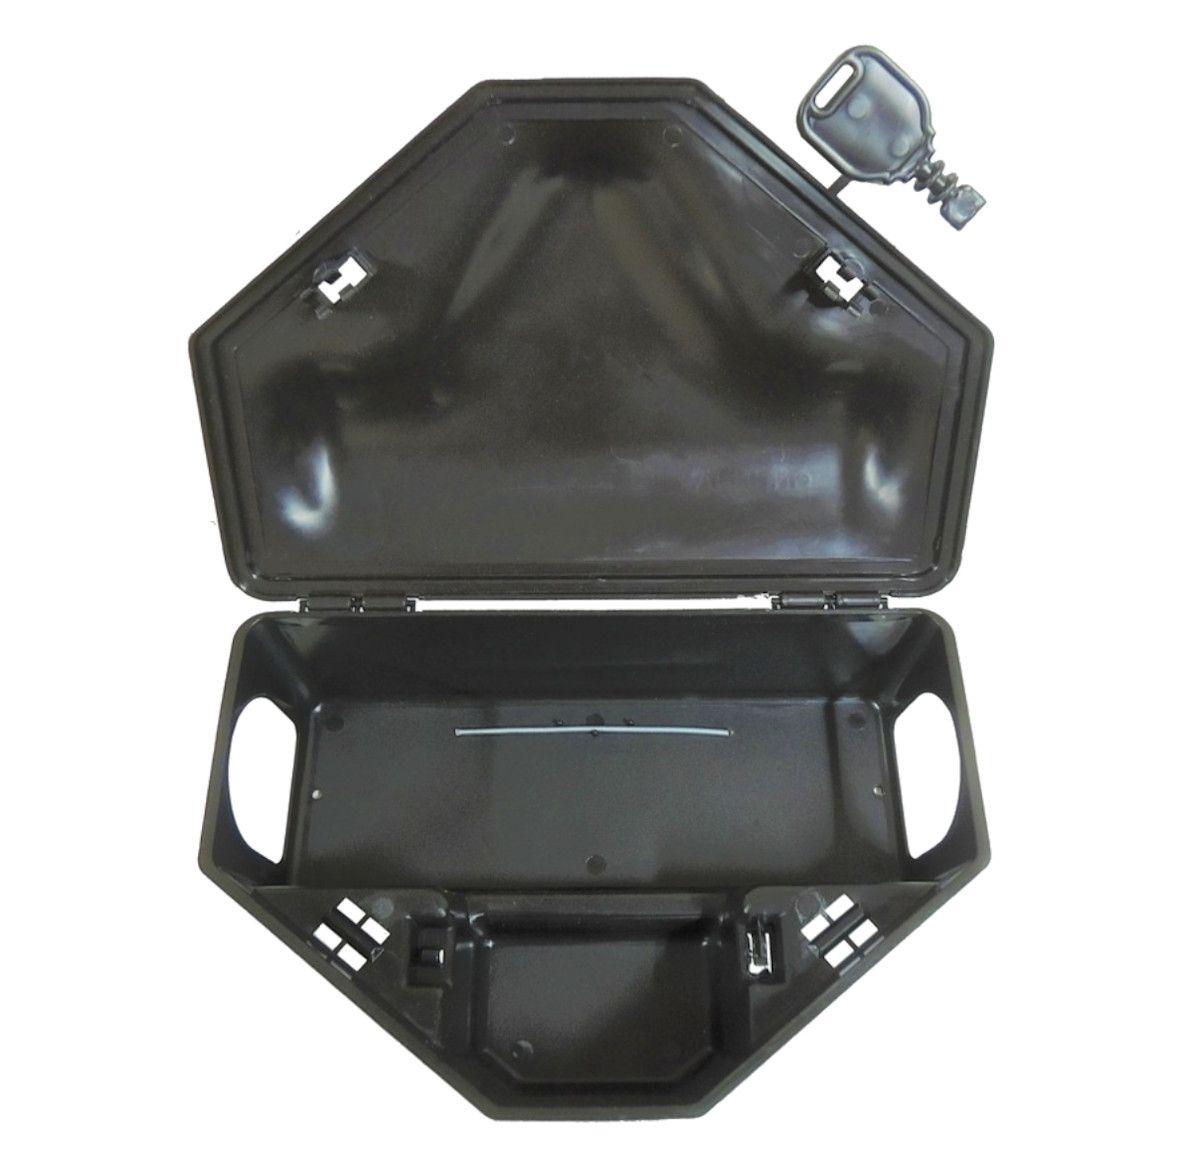 Kit 11 Porta Isca Com 2 Chaves - Duplo Travamento